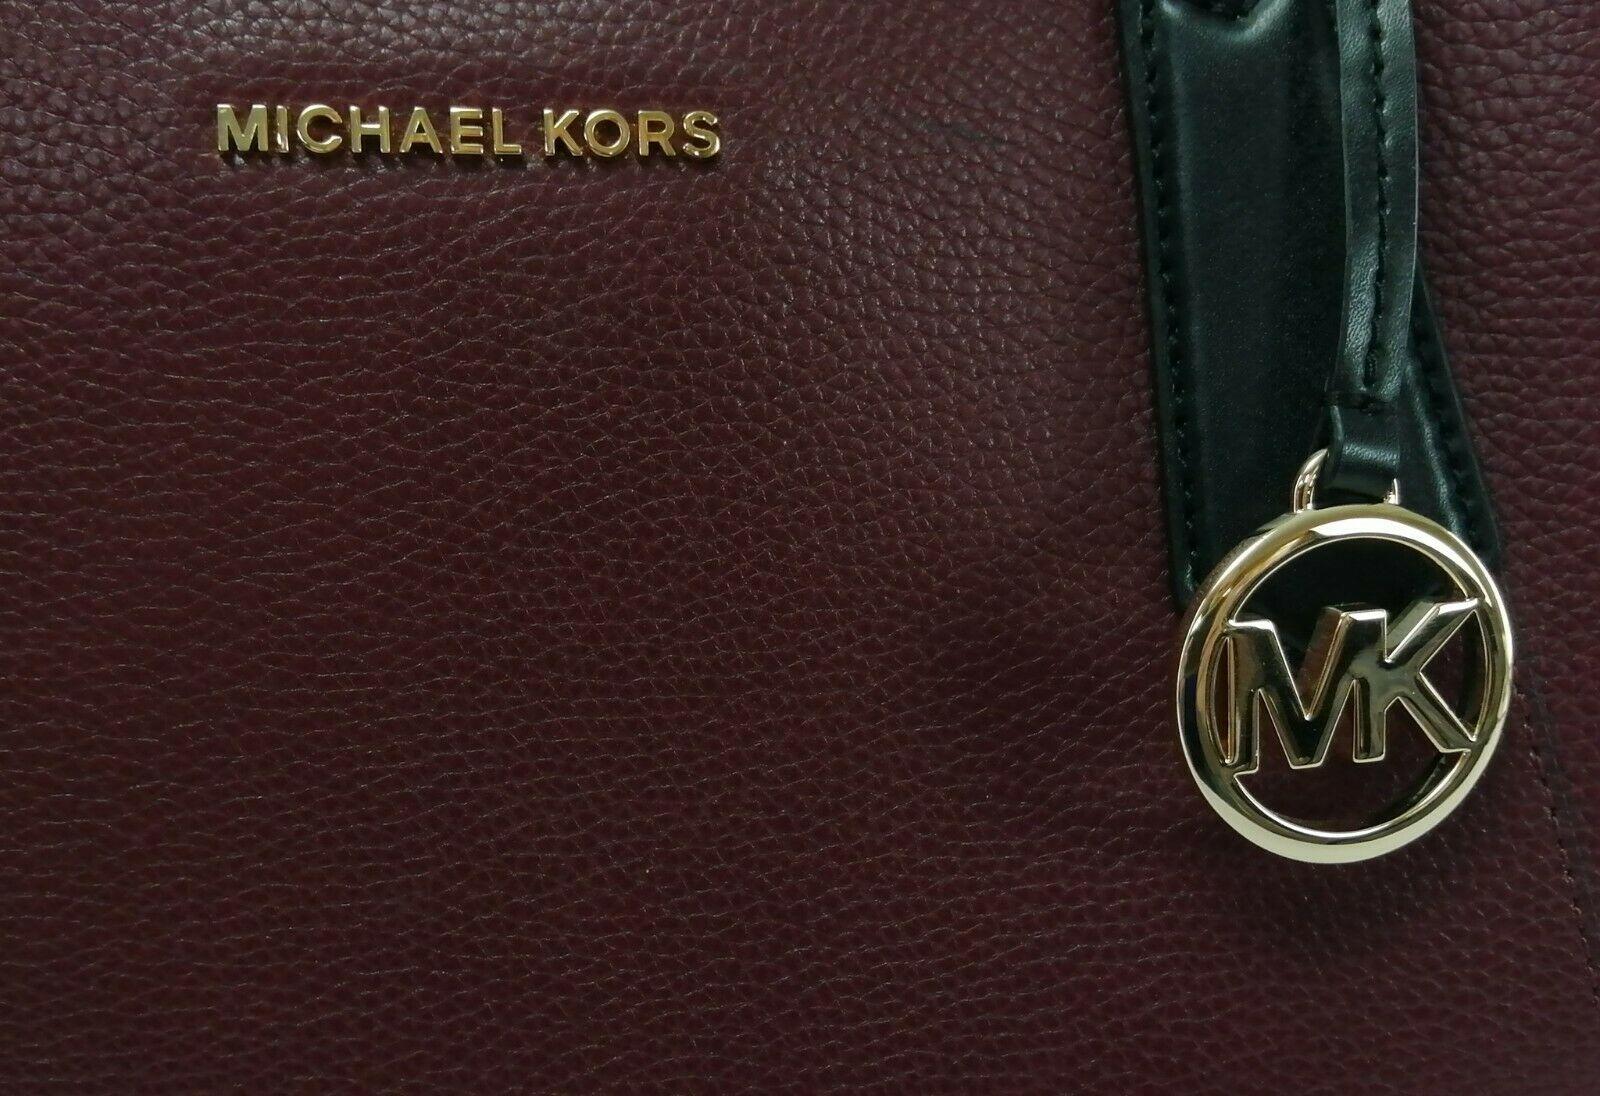 Michael Kors Cartella Top Manico Merlot pelle Rossa Kimberly Bag image 5